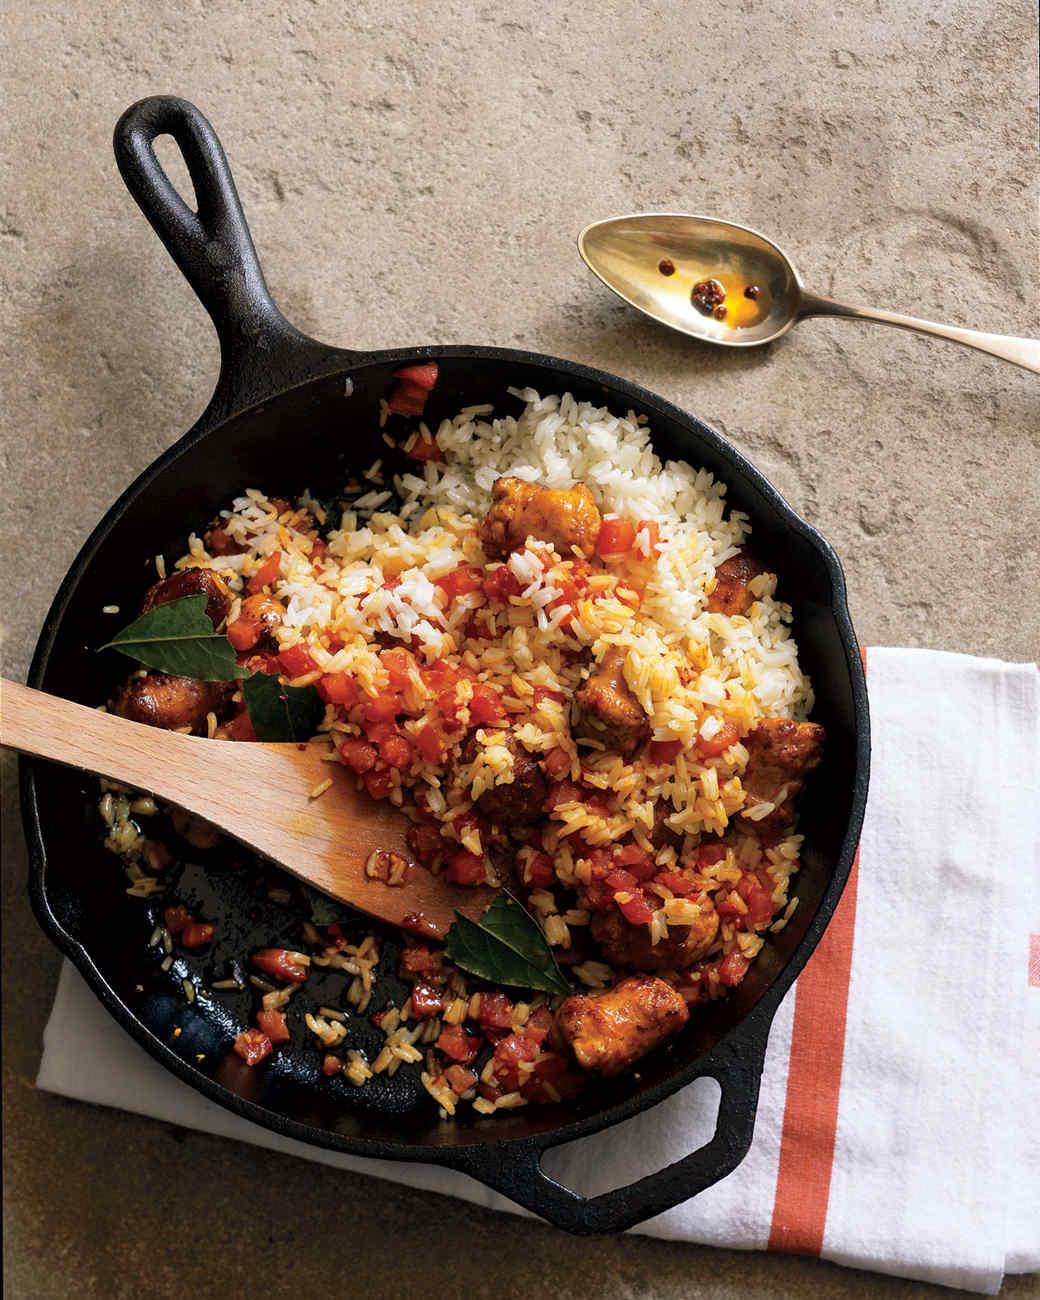 Annatto Rice With Sausage and Tomato